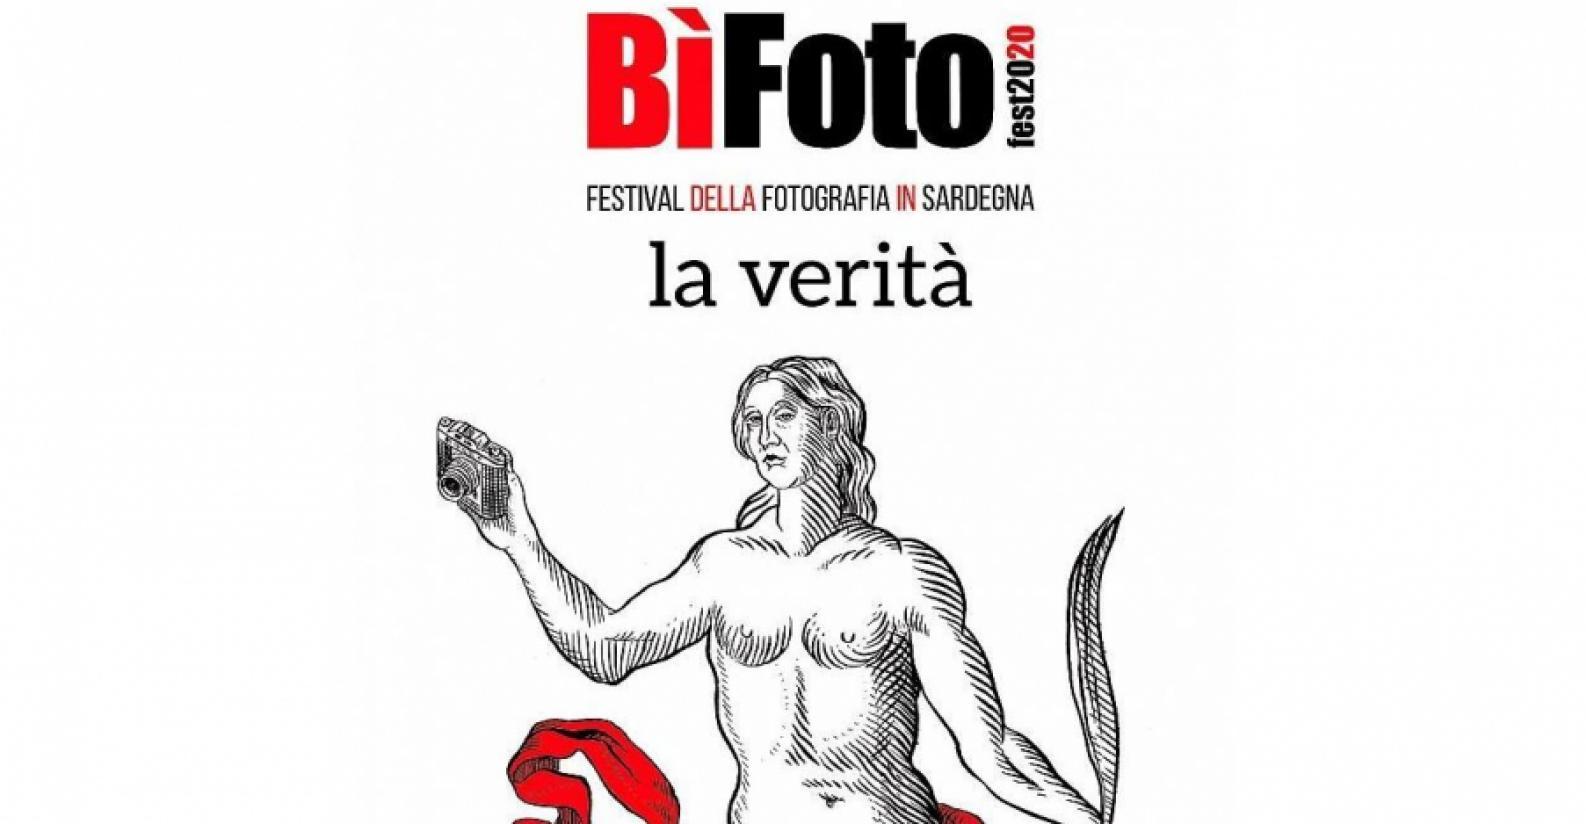 BiFoto